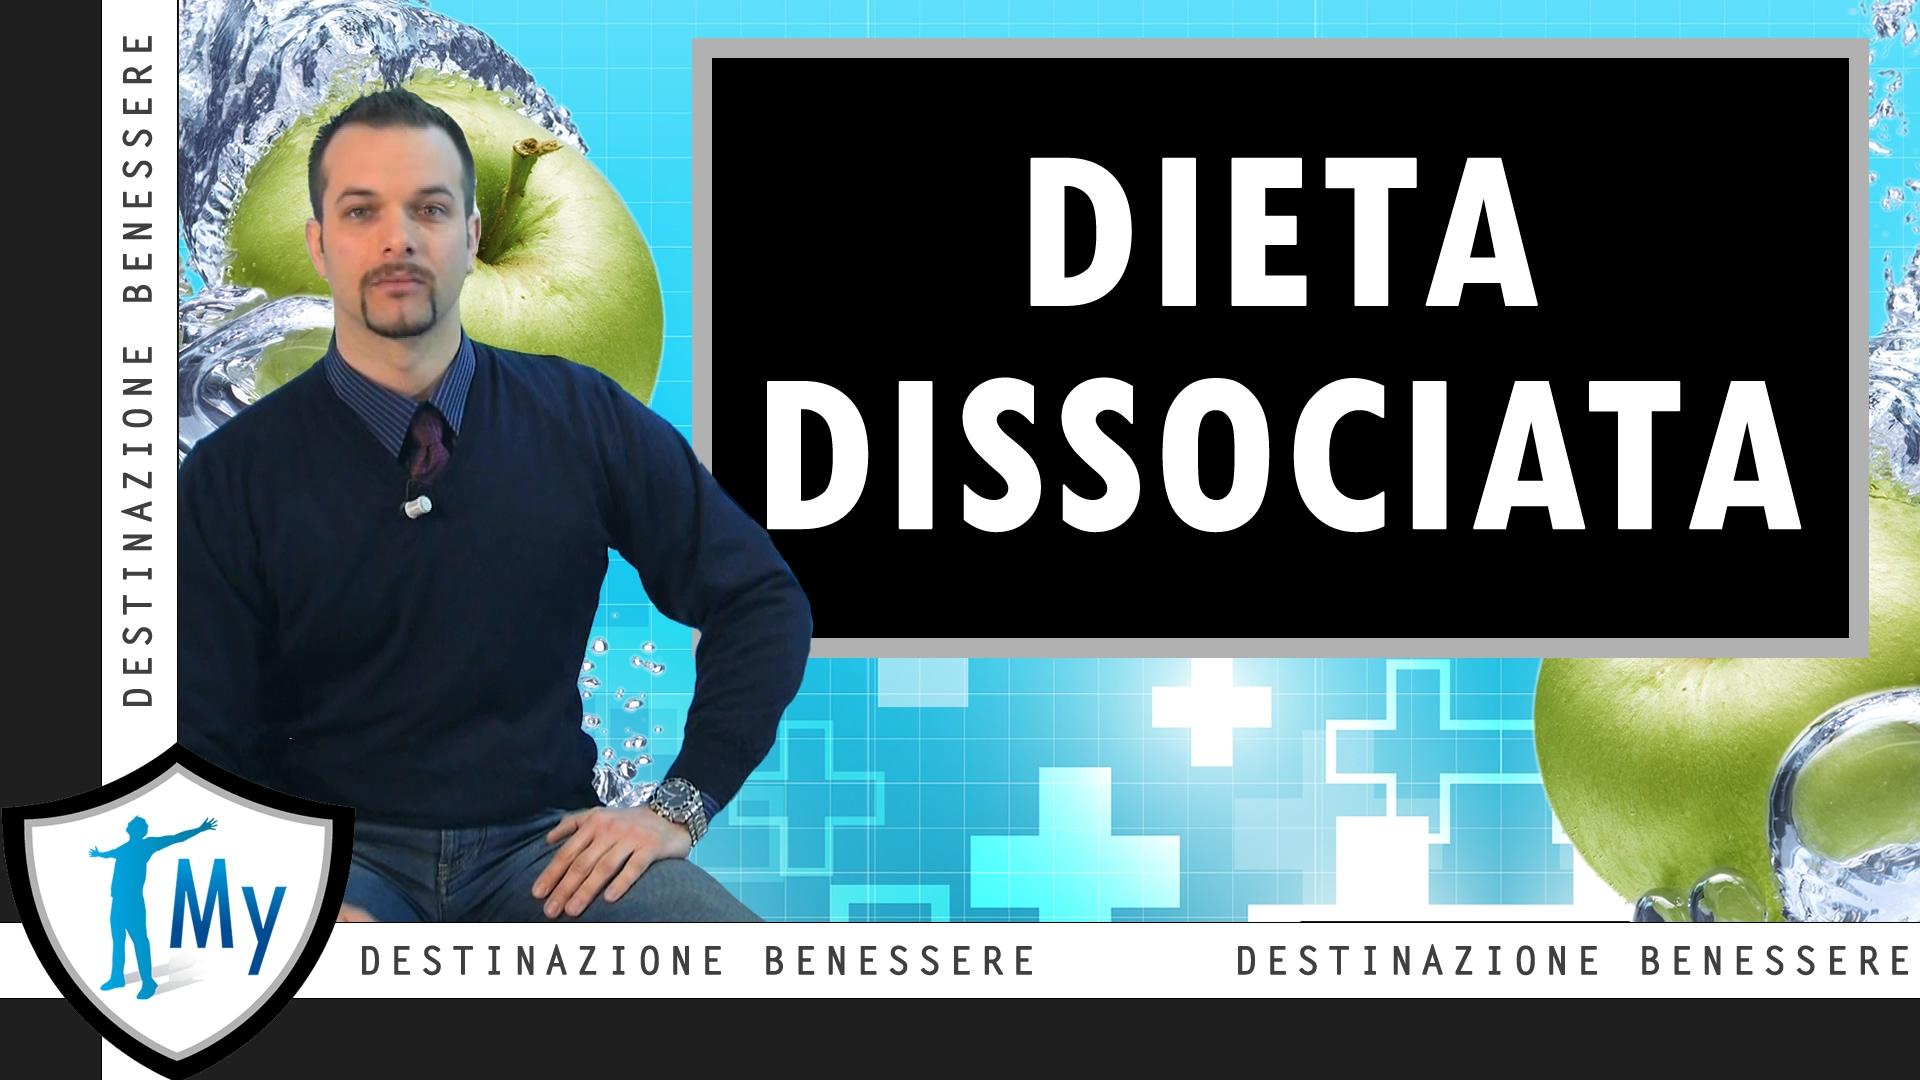 gruppi dietetici dissociati